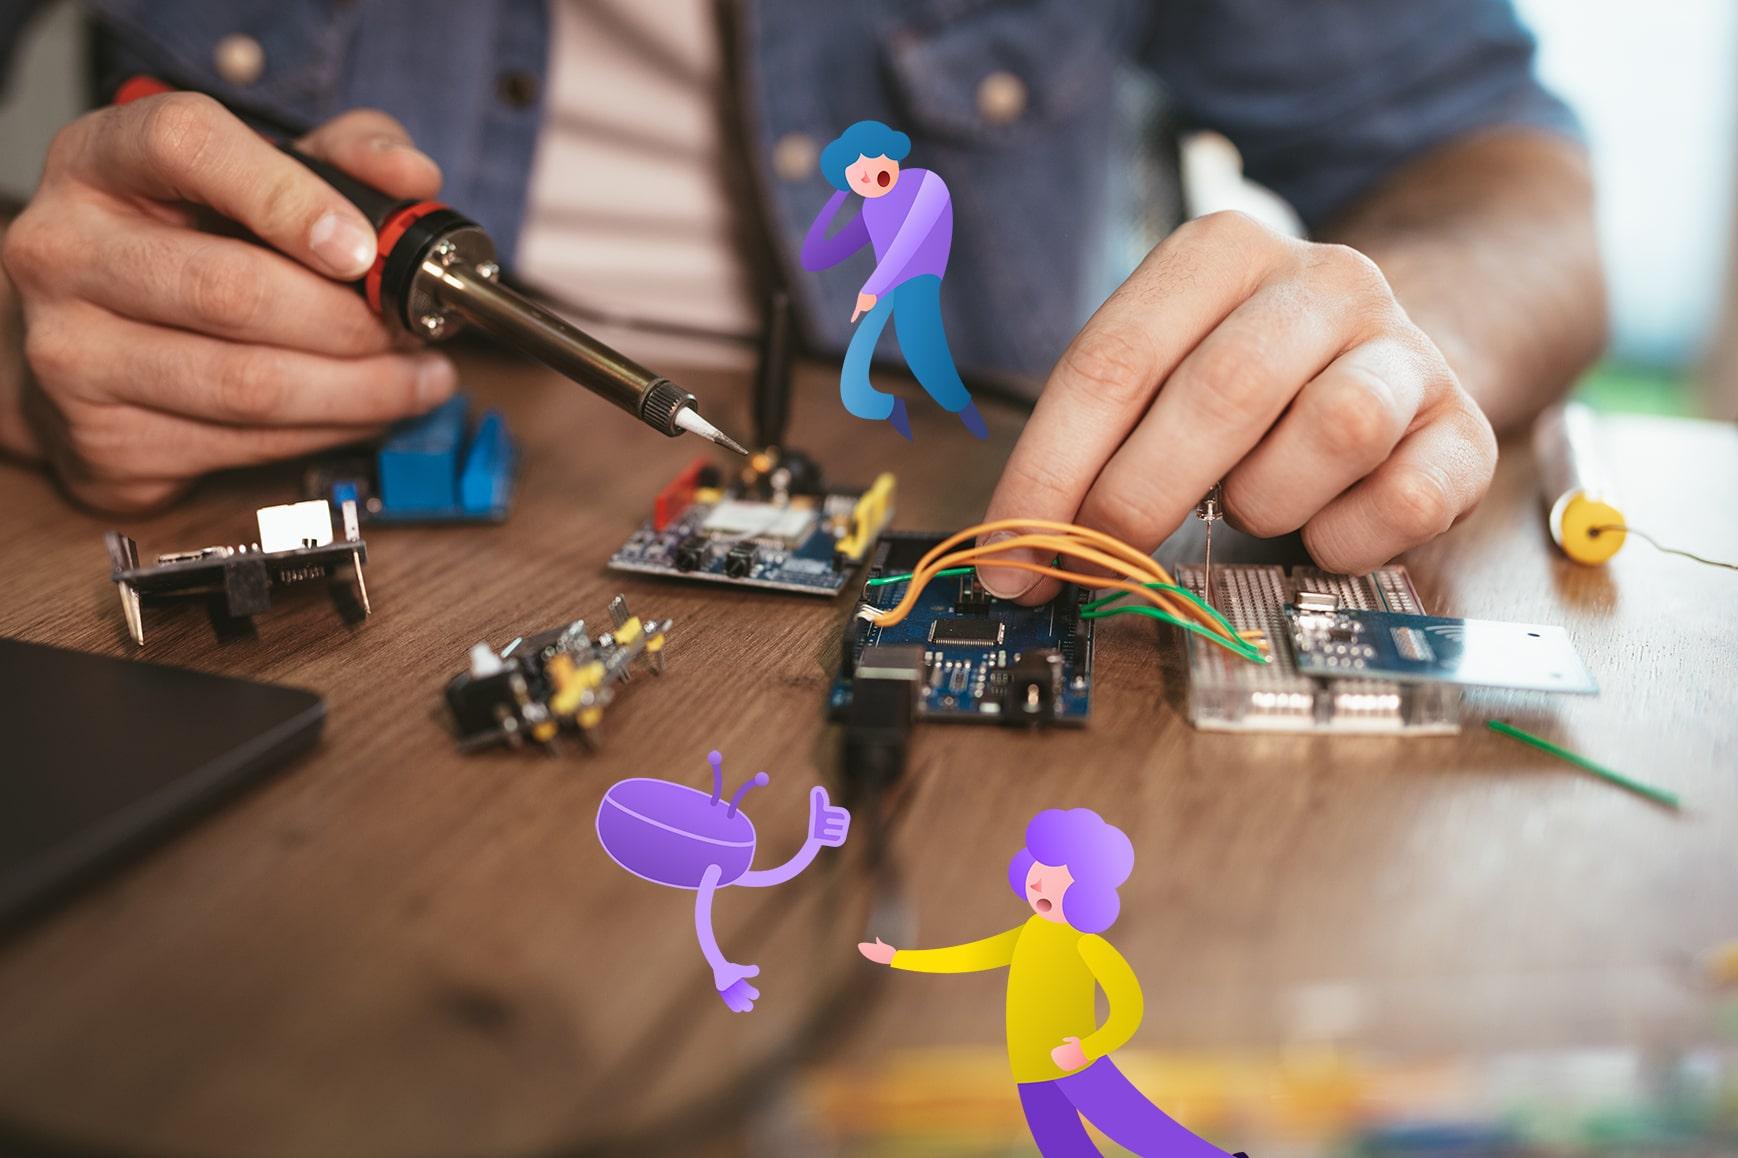 soldering-electronic-circuit-board-52QJNSA-min